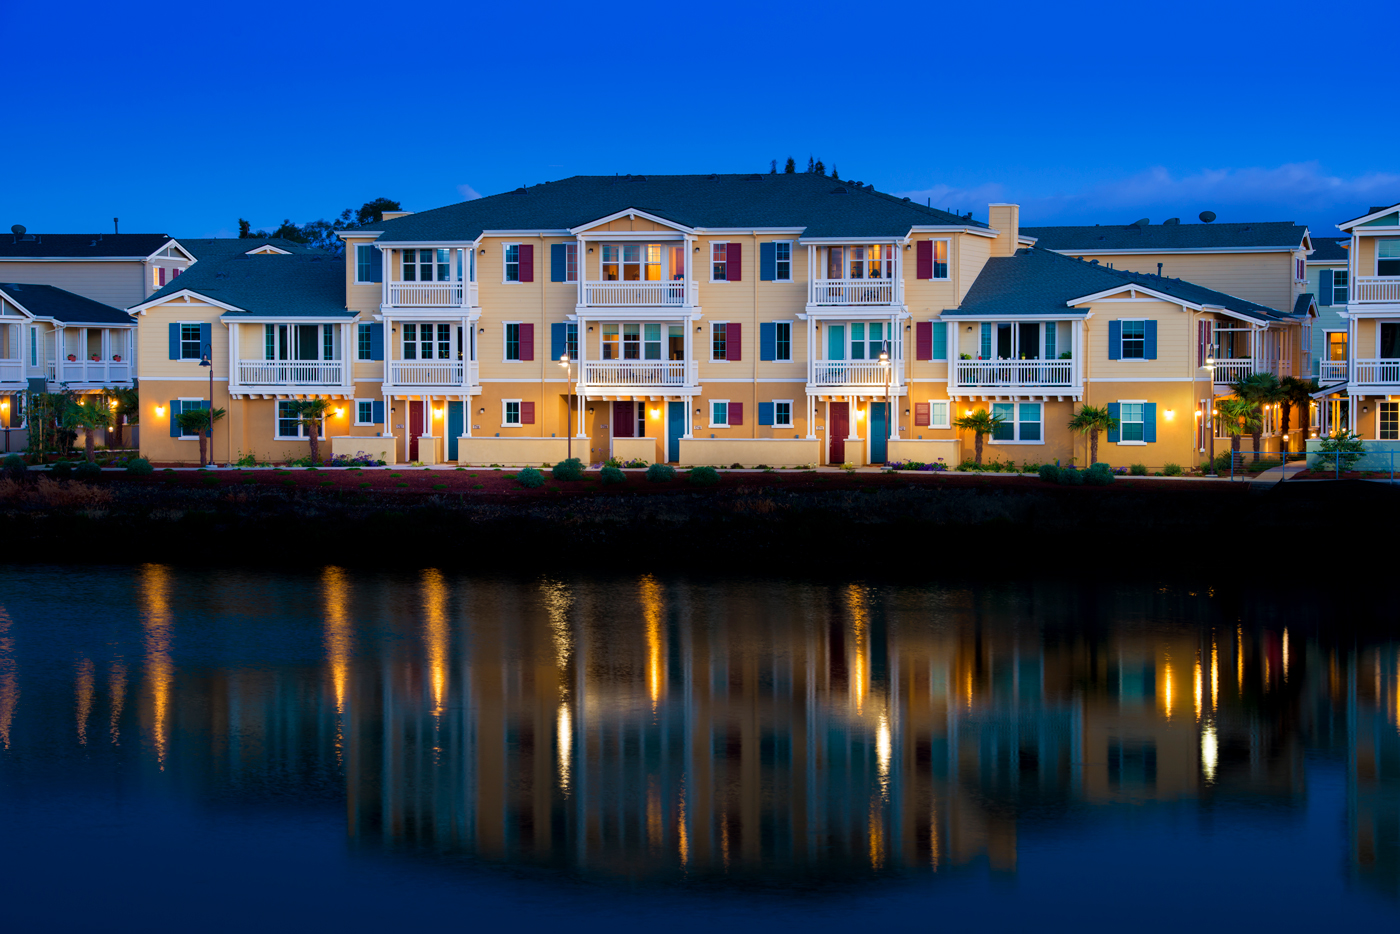 One Marina Twilight Exterior